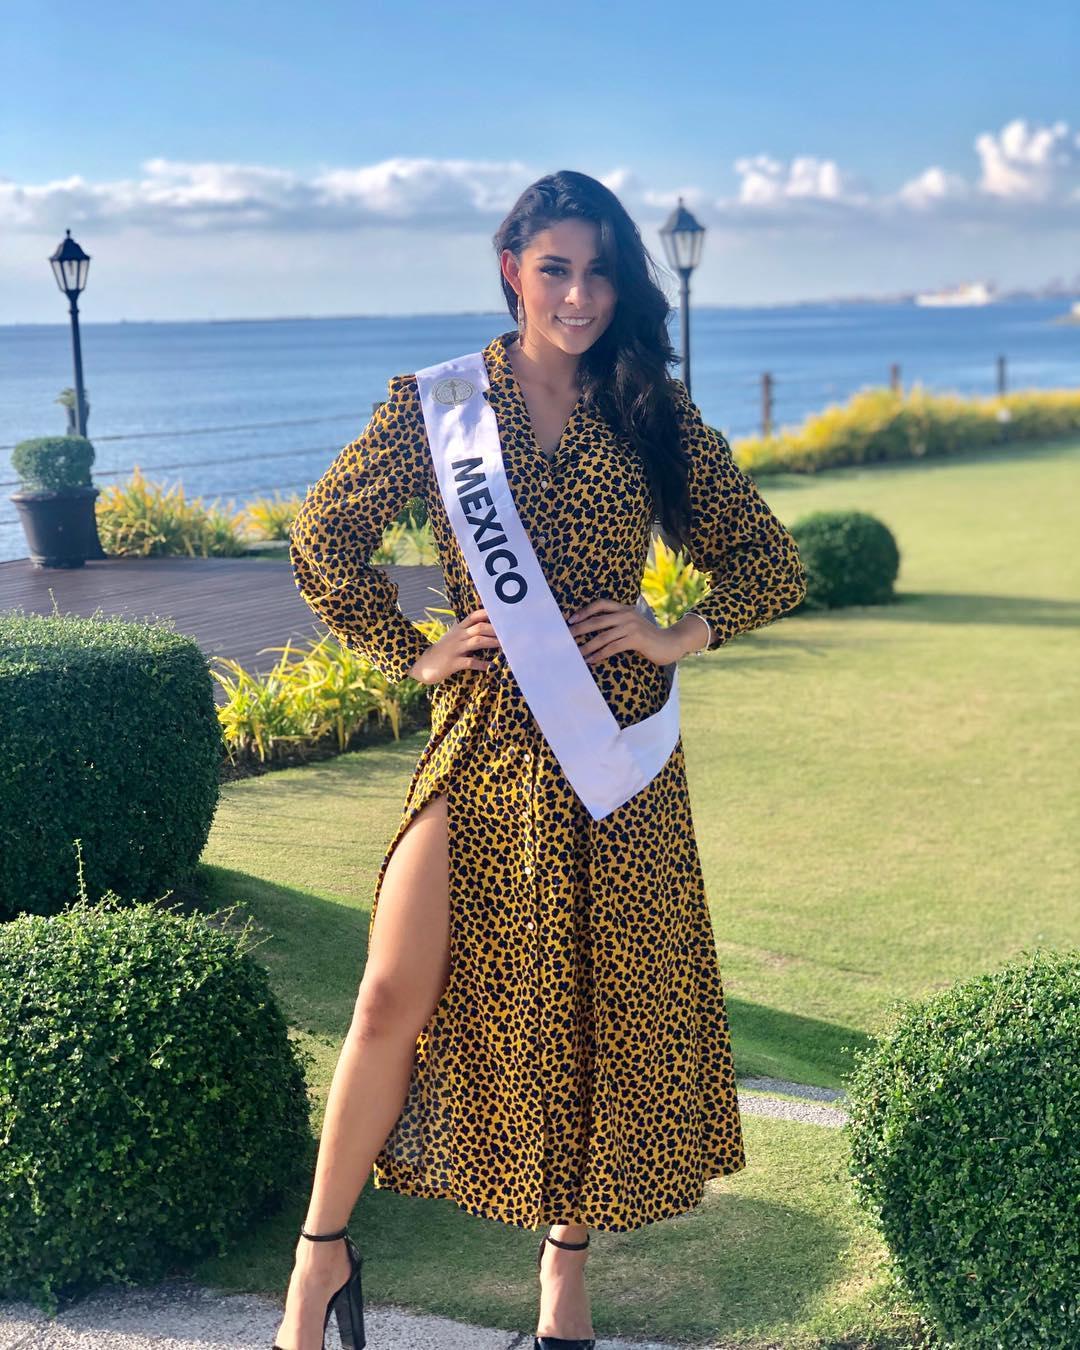 ivanna lobato barradas, top 20 de miss intercontinental 2018-2019. - Página 4 50072510